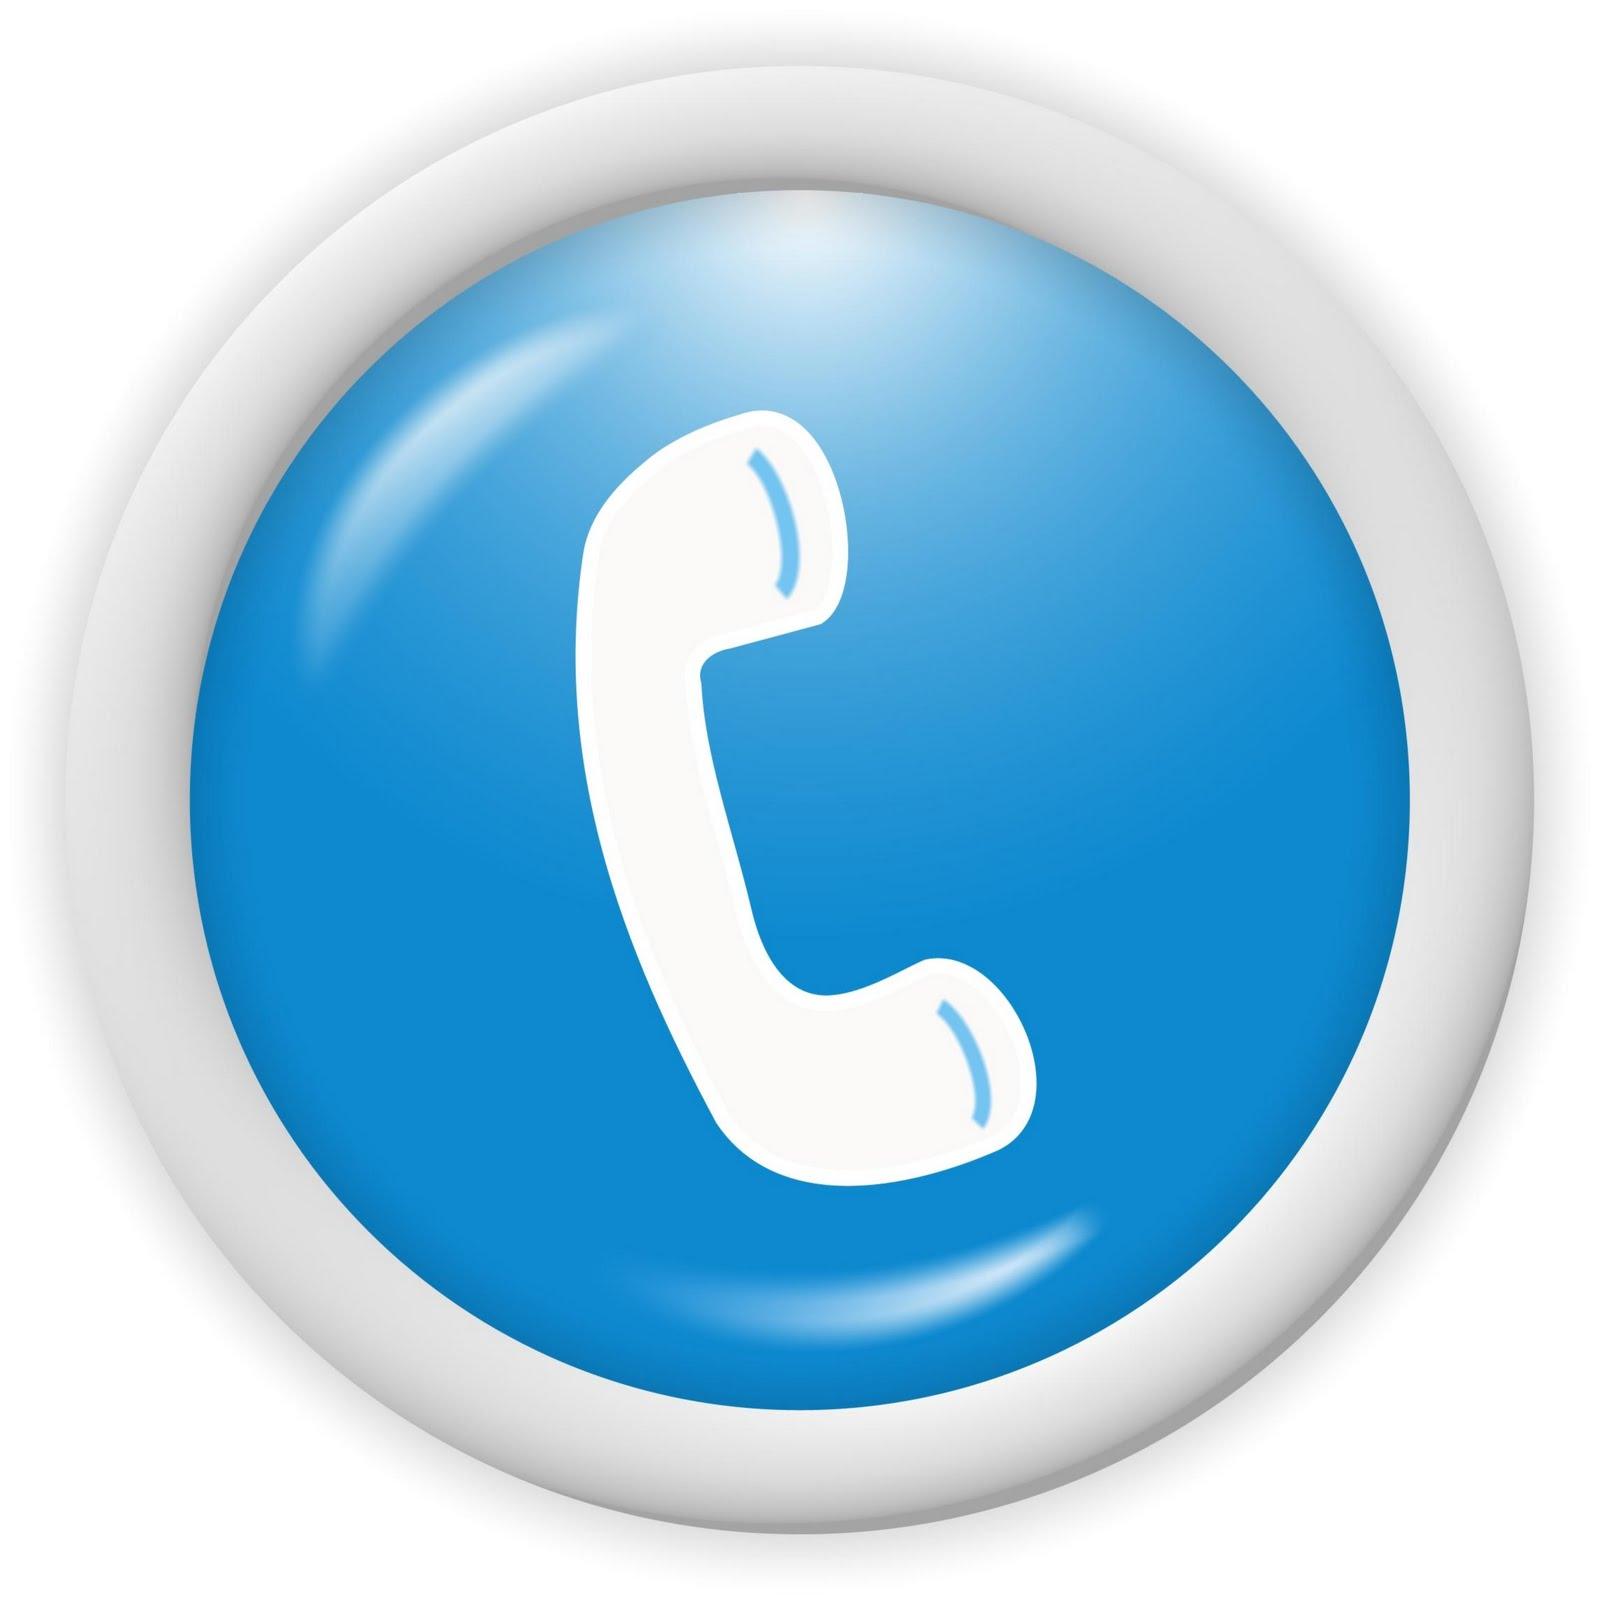 llamadas celular internacionales: